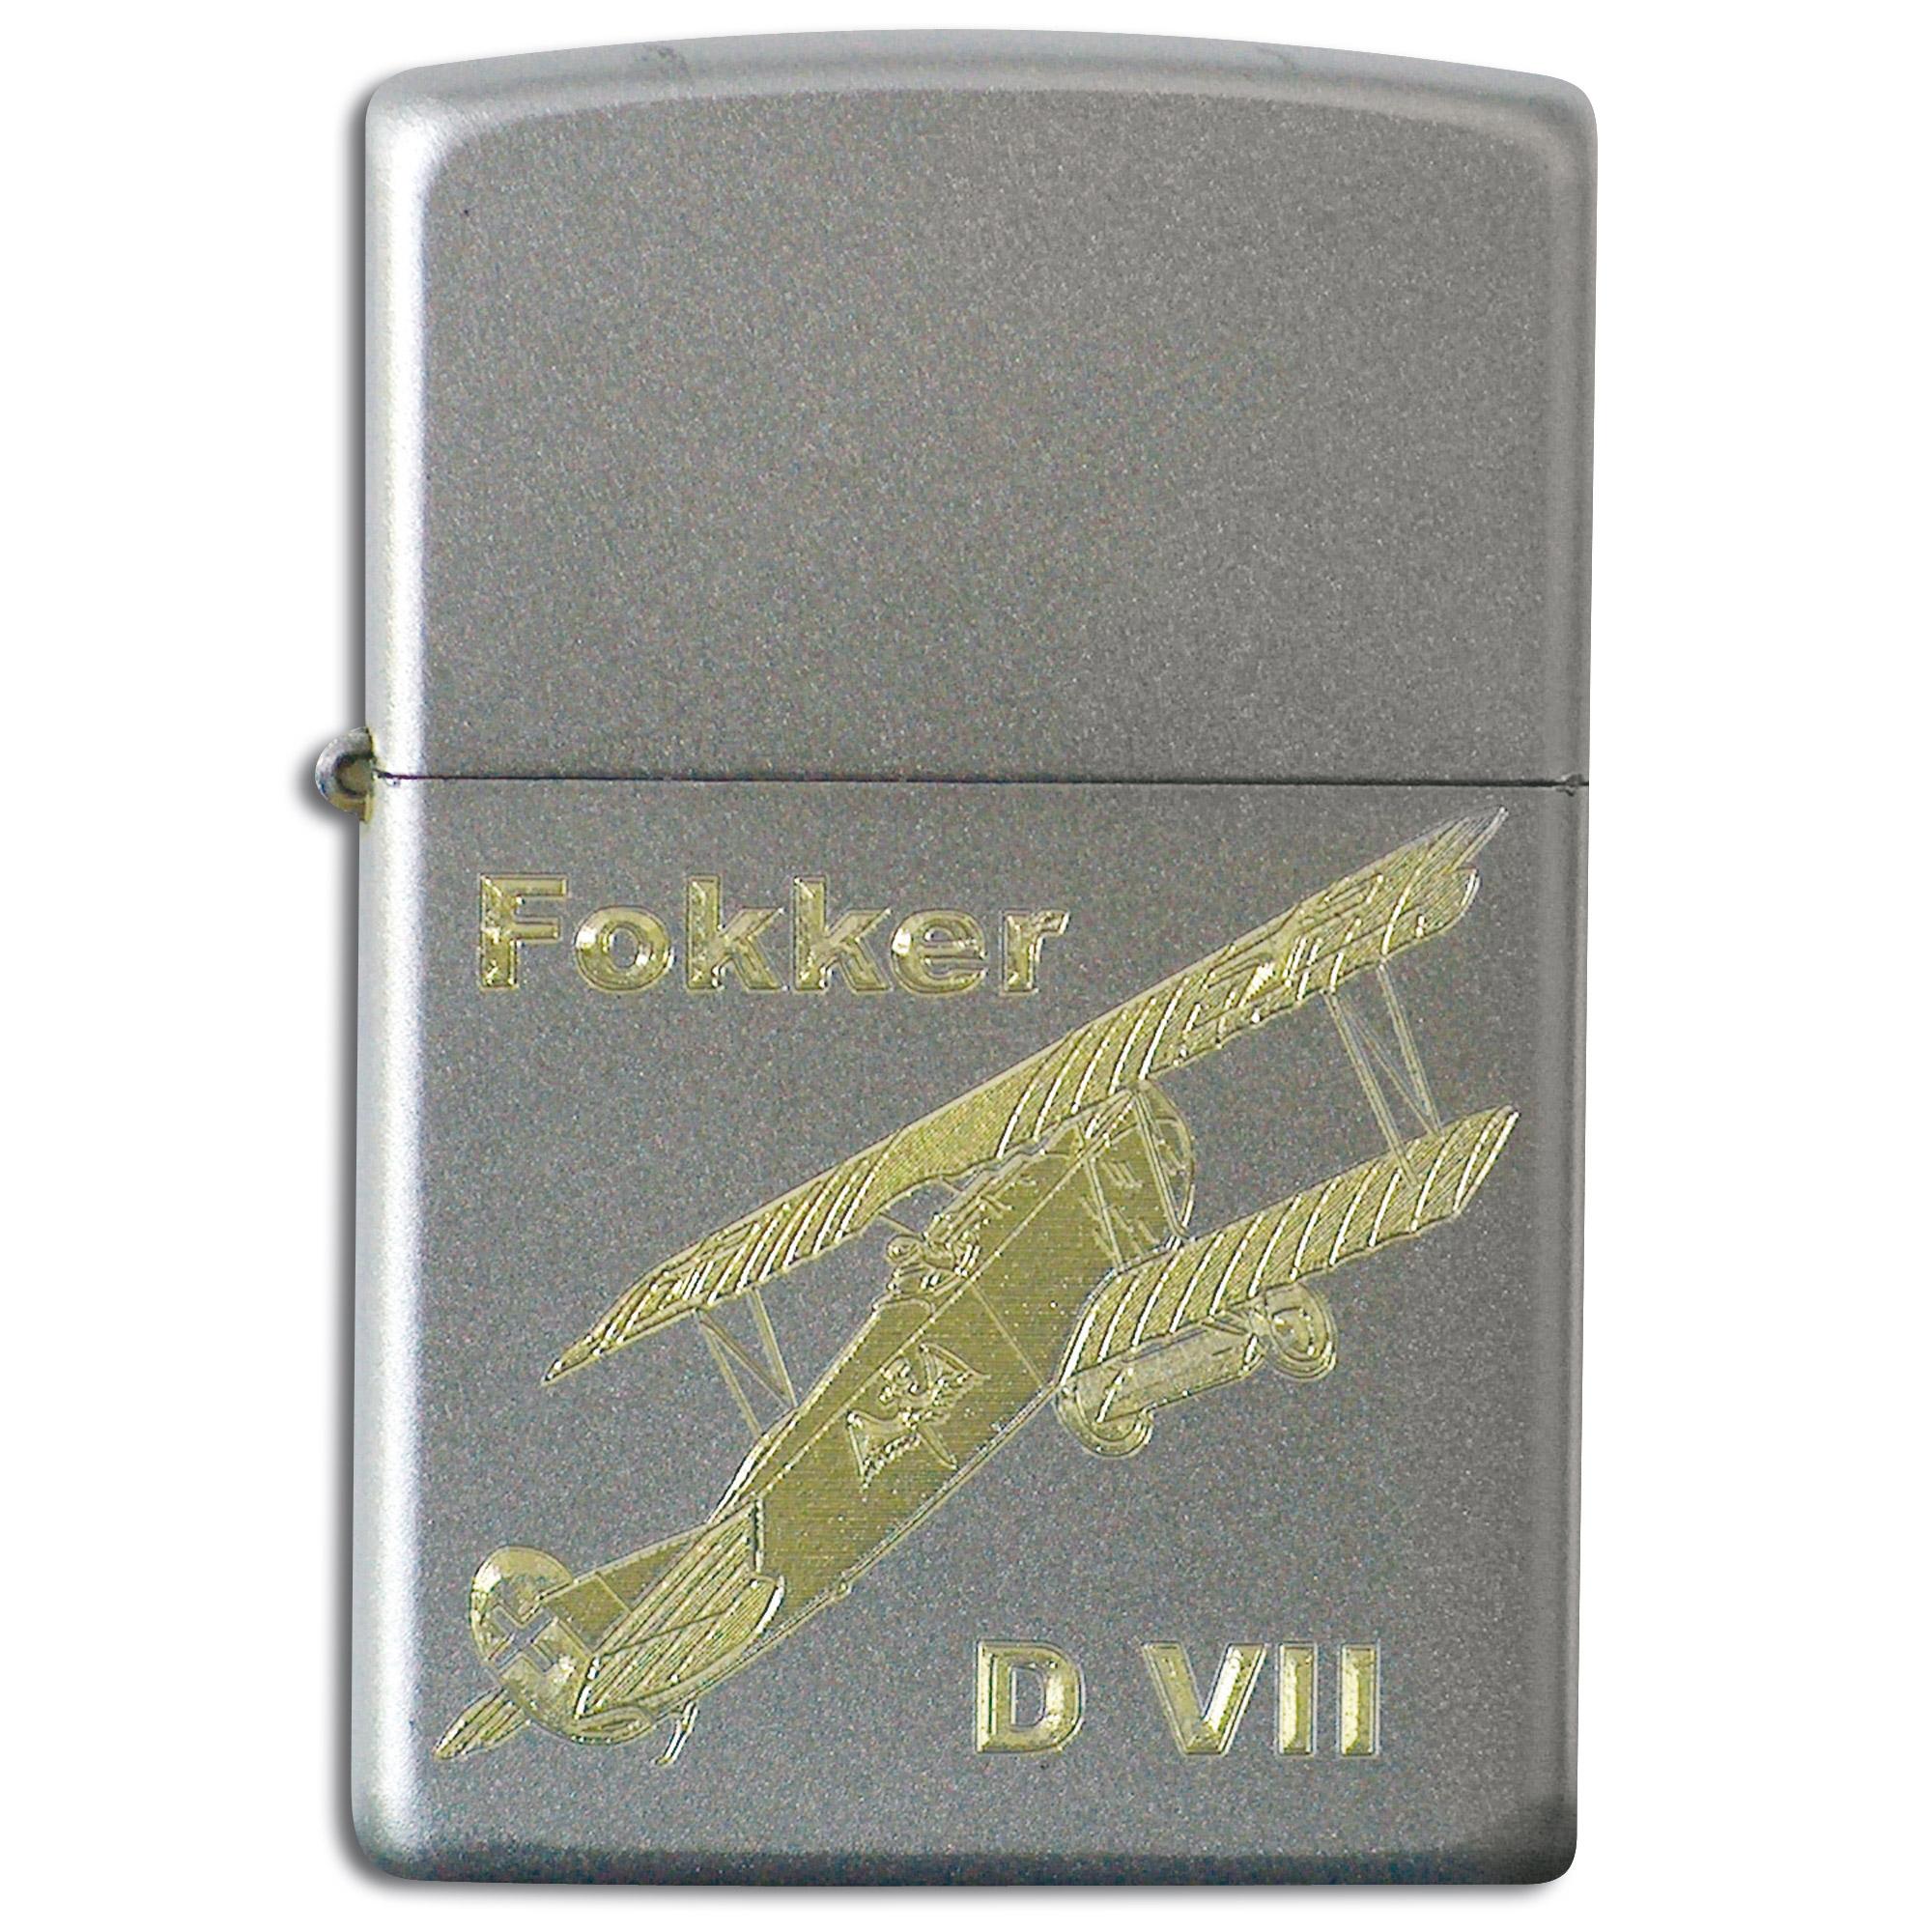 Zippo grabado con Fokker D VII